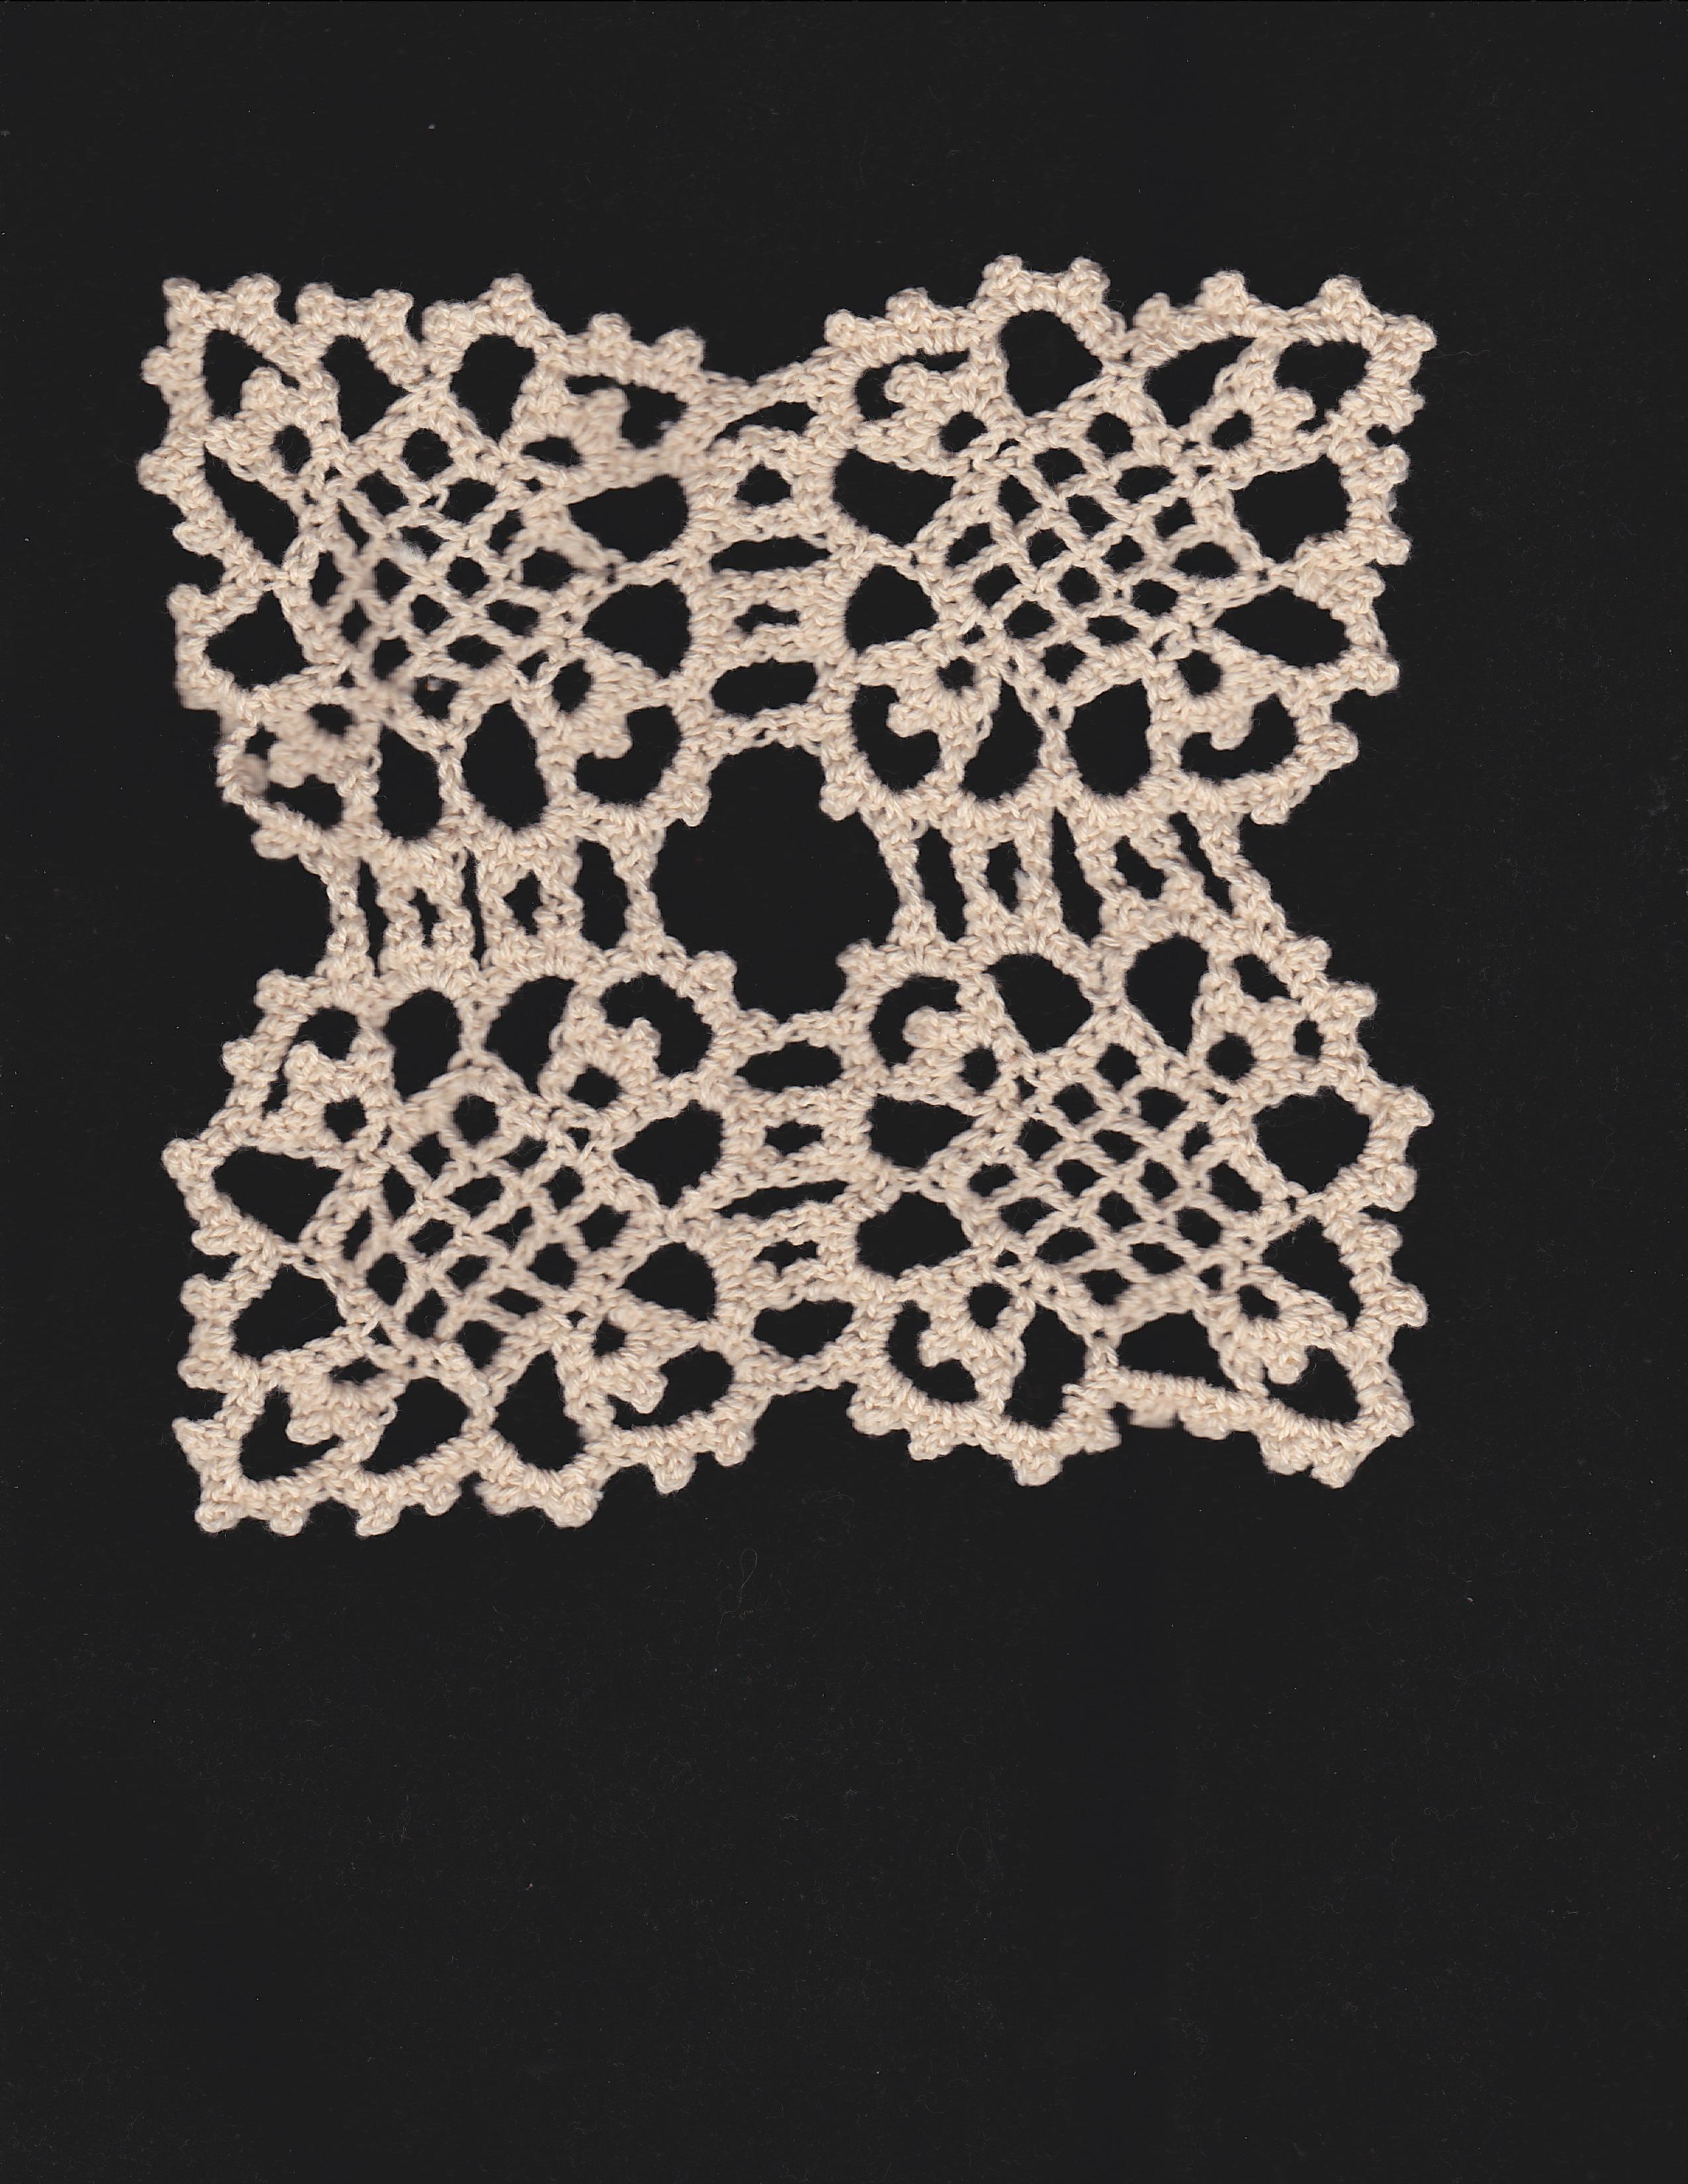 Celtic Knot Symbol for Family